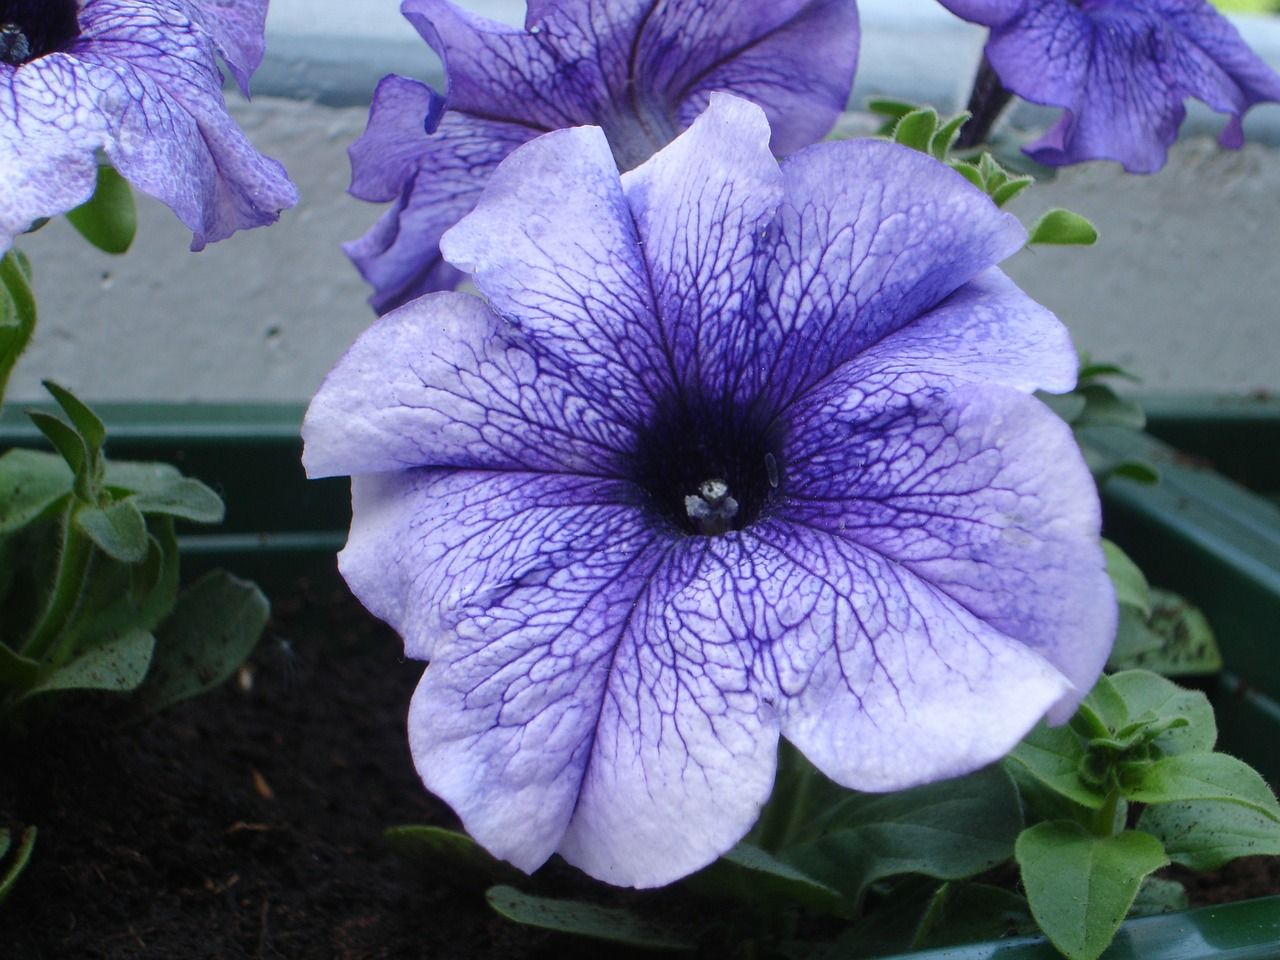 Free Image On Pixabay Petunia Flower Purple Bloom Petunias Petunia Flower Purple Petunias